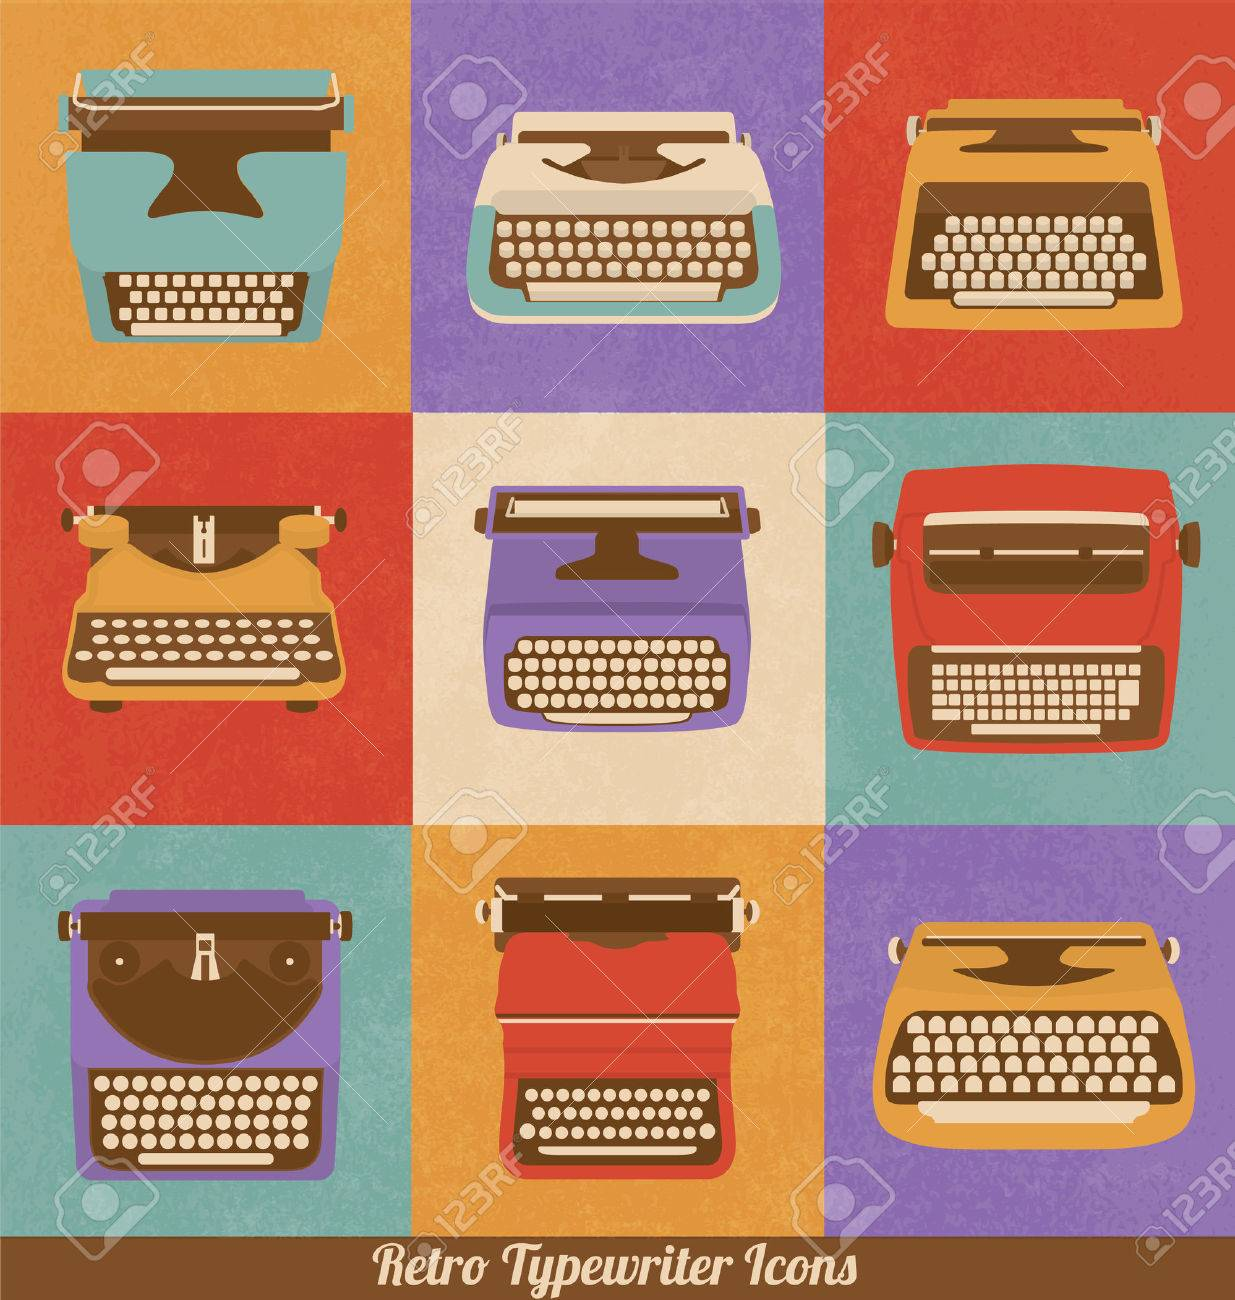 Retro Style Typewriter Icons - Vintage Elements - Nostalgic Design - Vector Set - 24014946